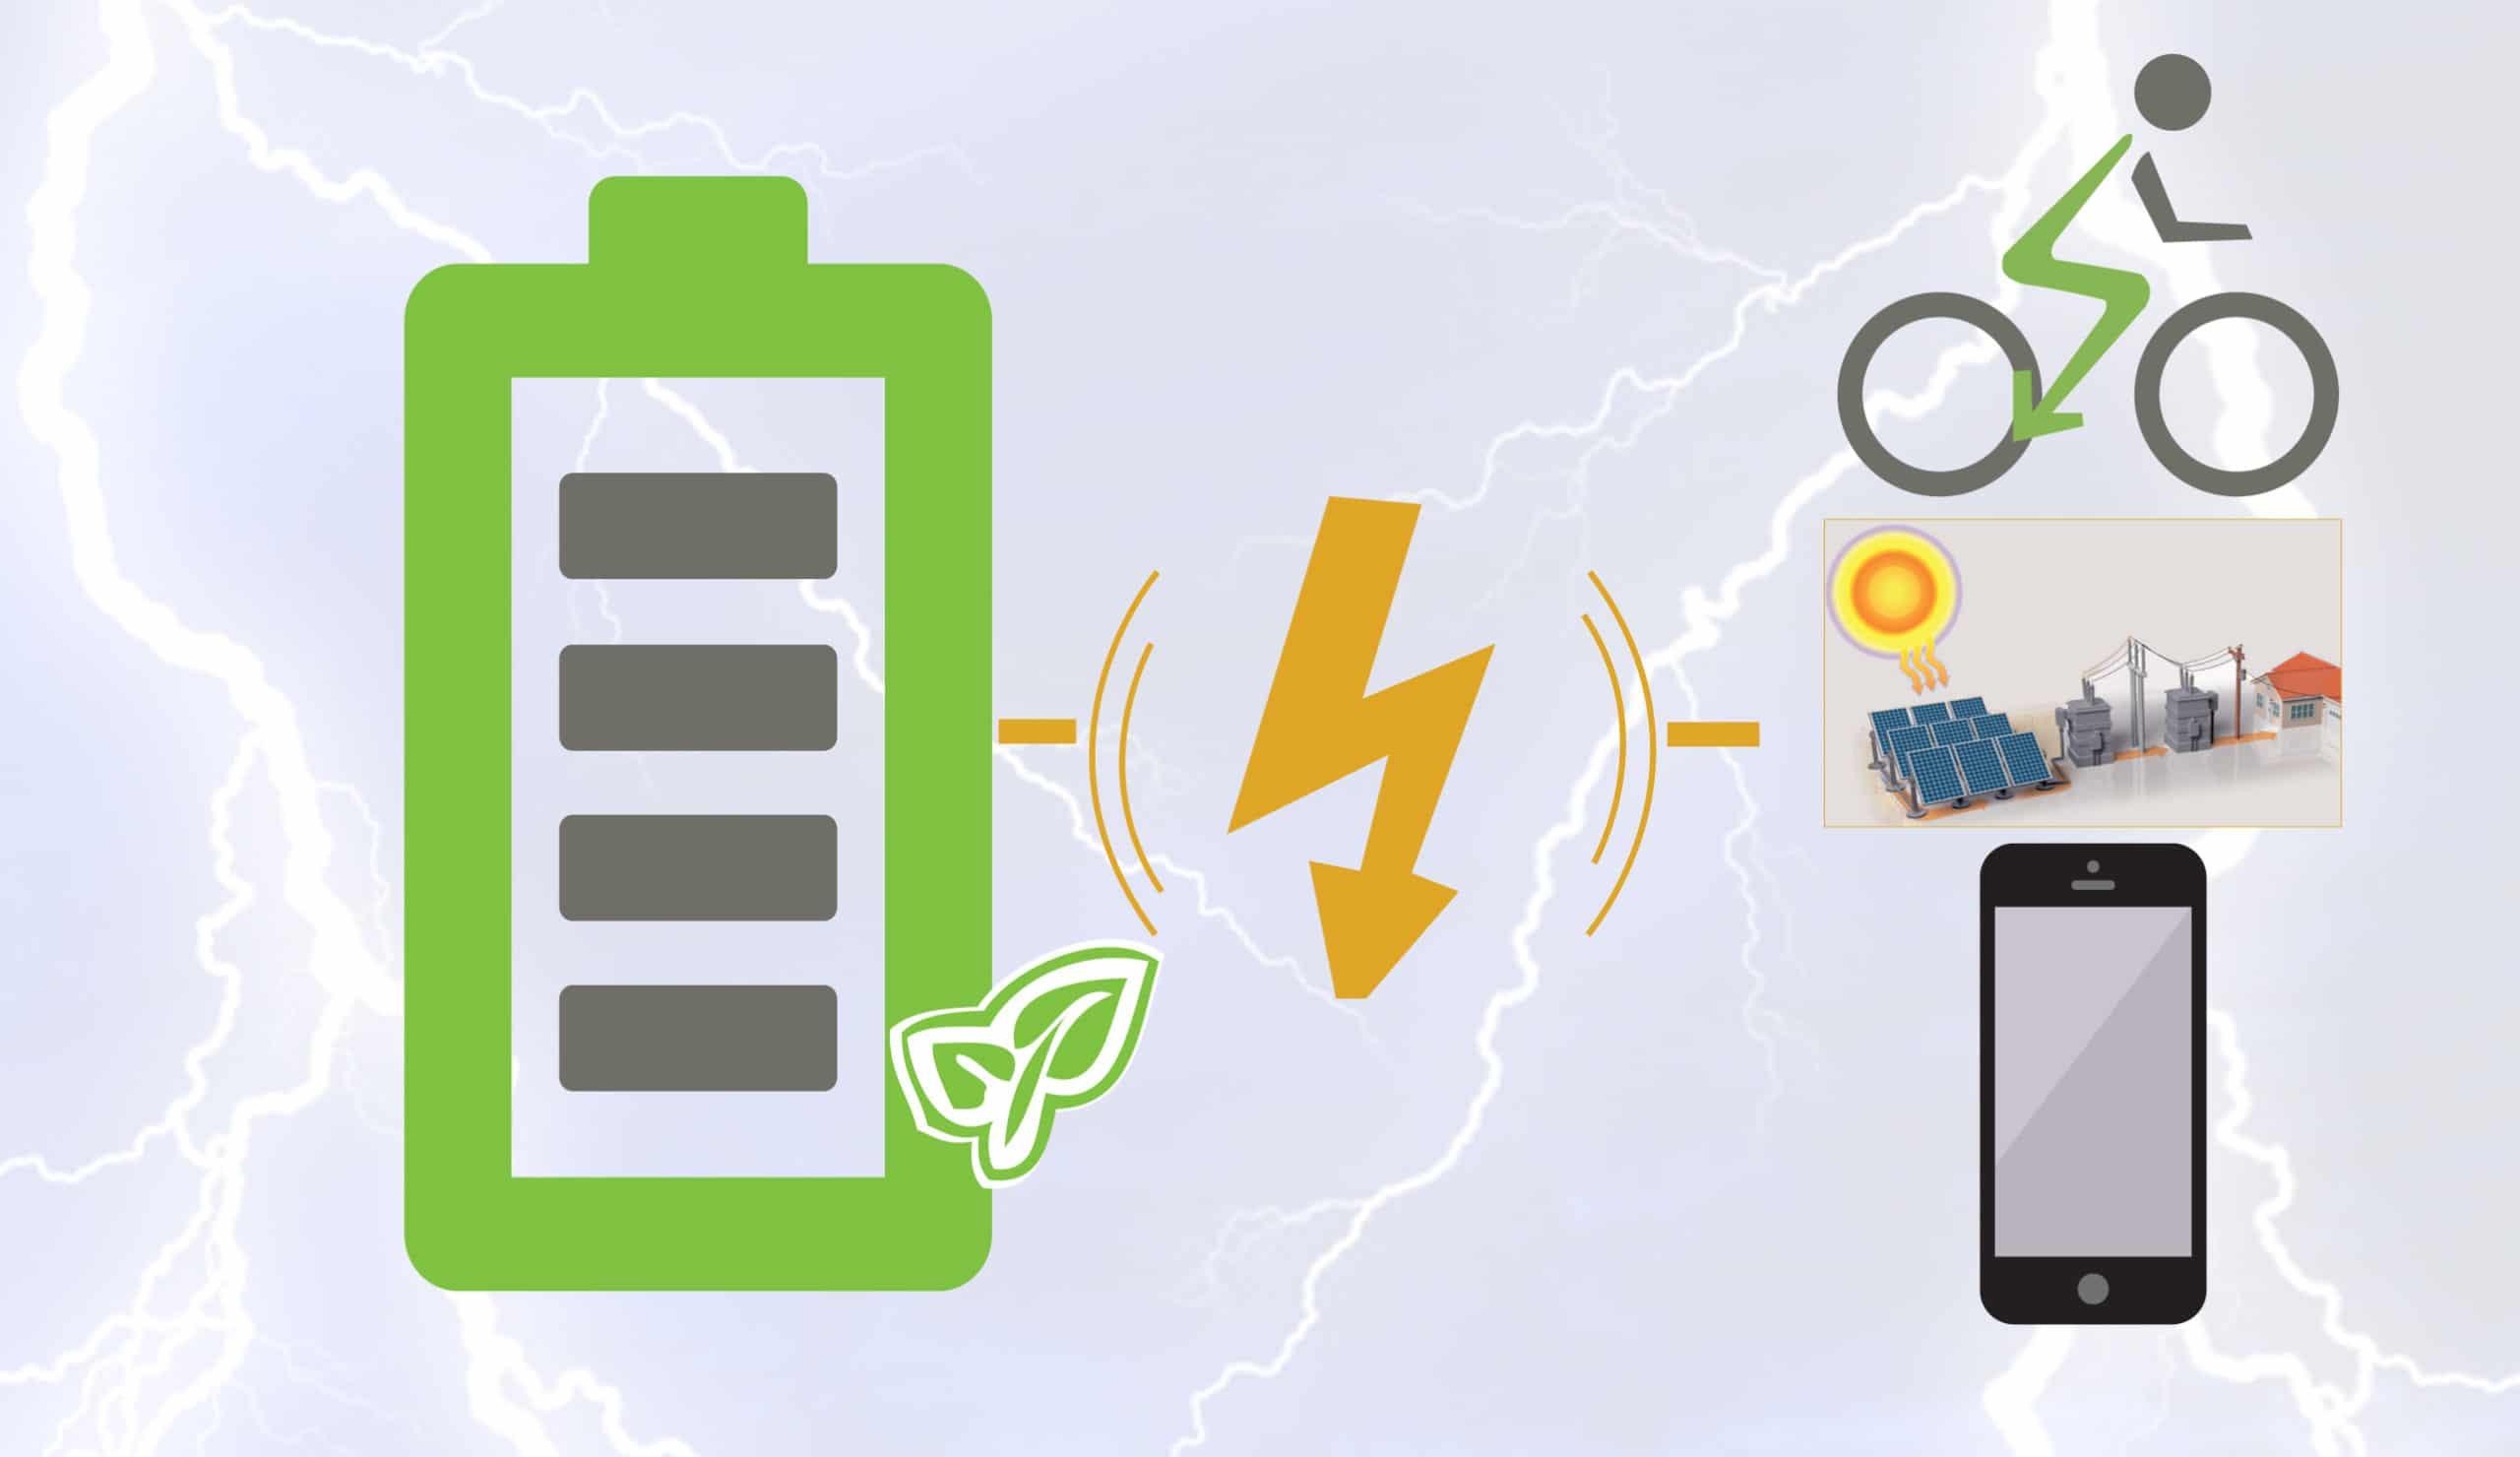 Ion Battery Li Application